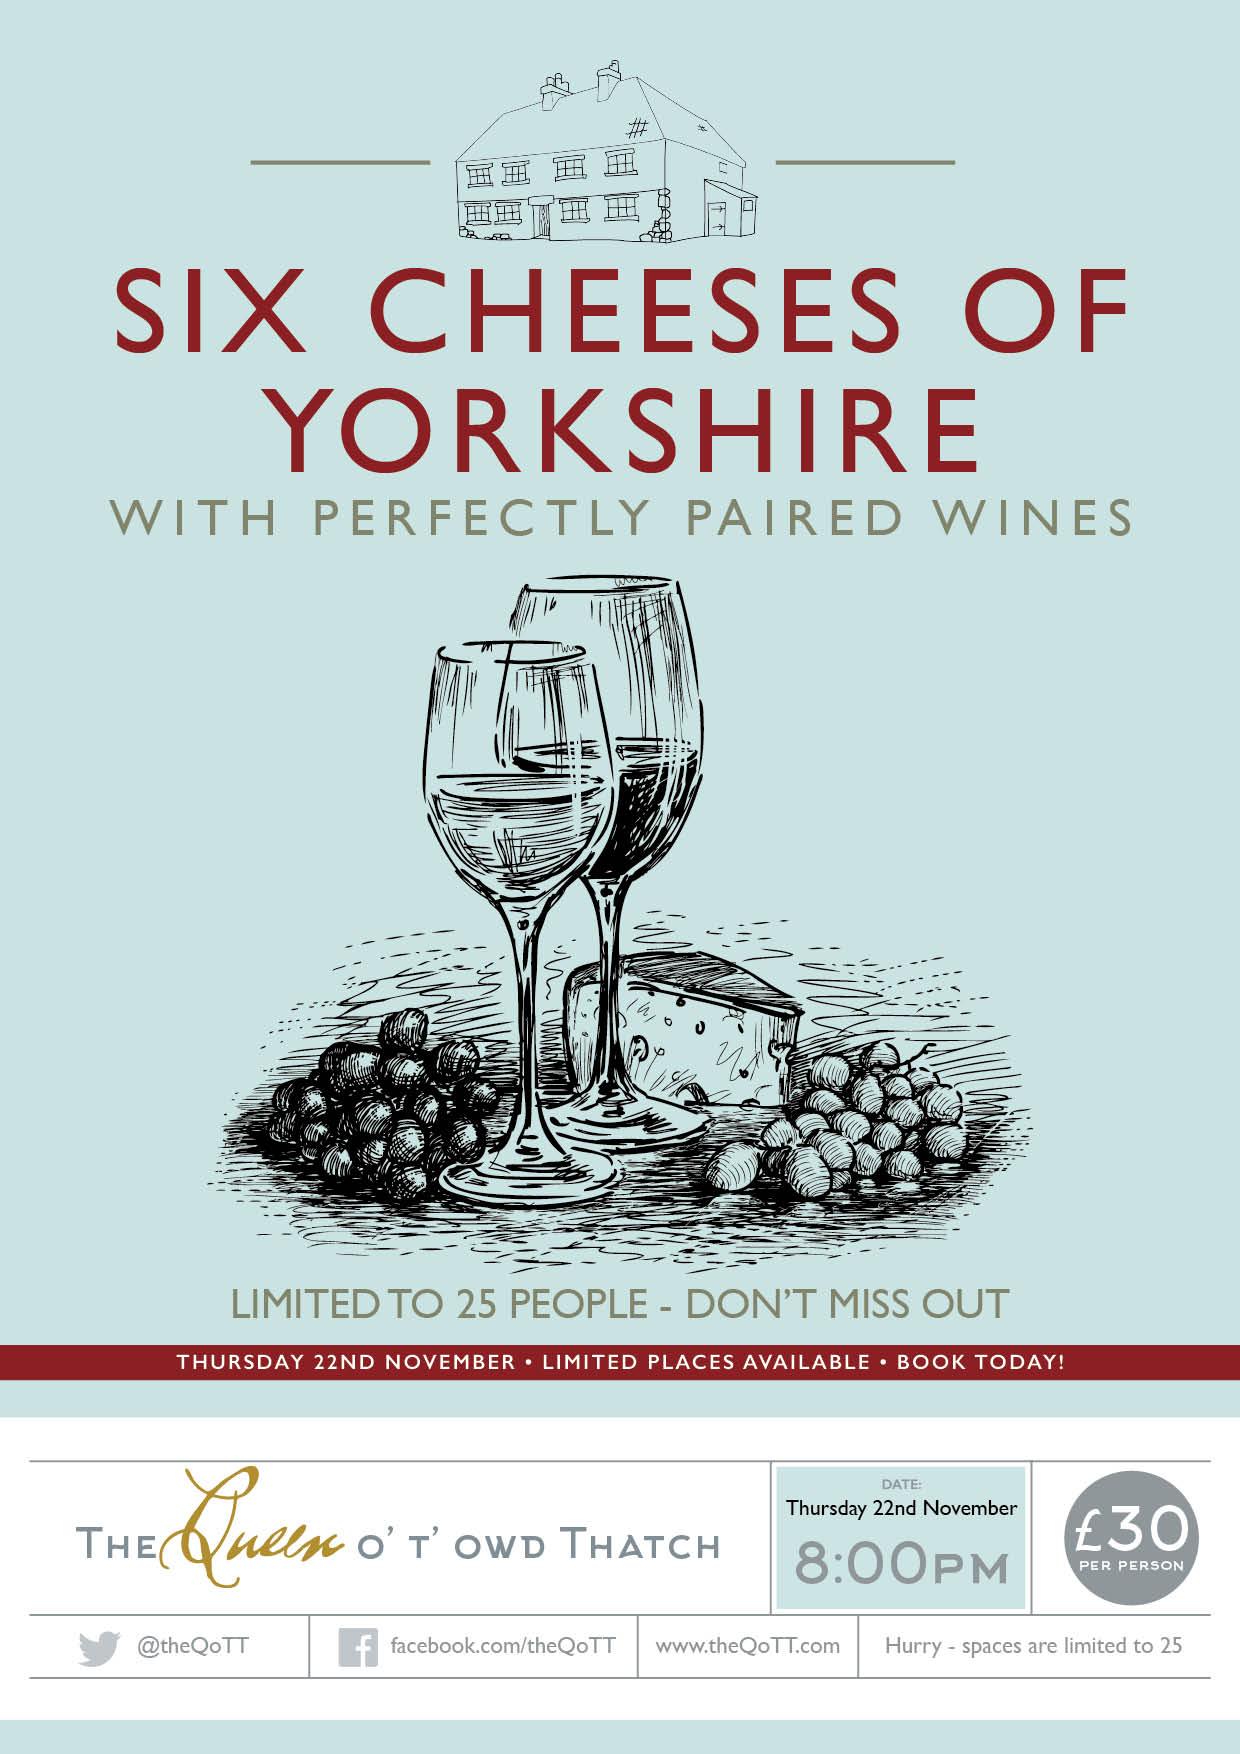 22nd_november_cheese_and_wine.jpg